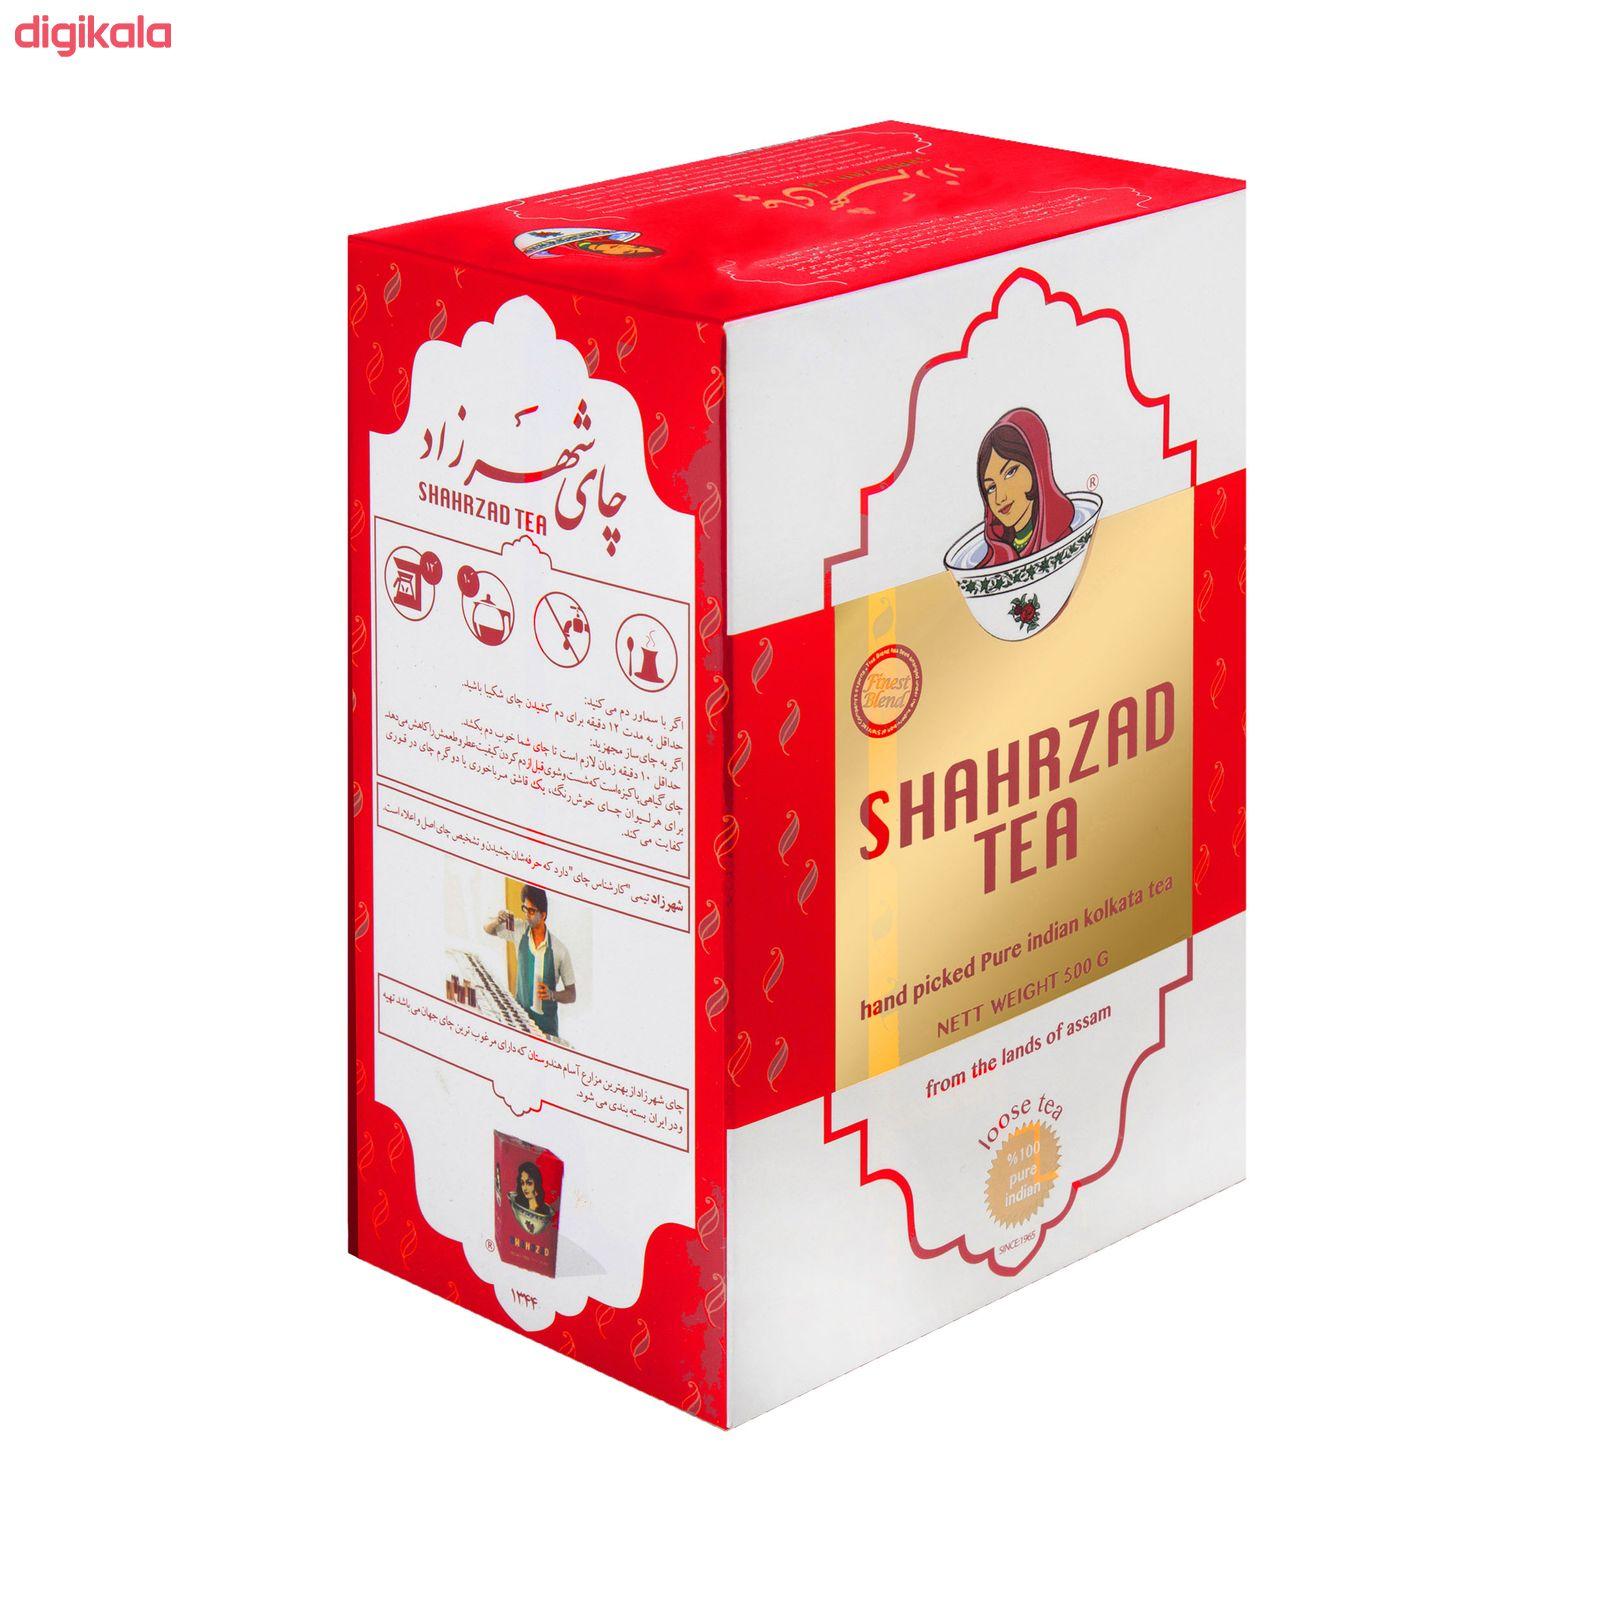 چای کلکته هندوستان شهرزاد - 400 گرم main 1 1